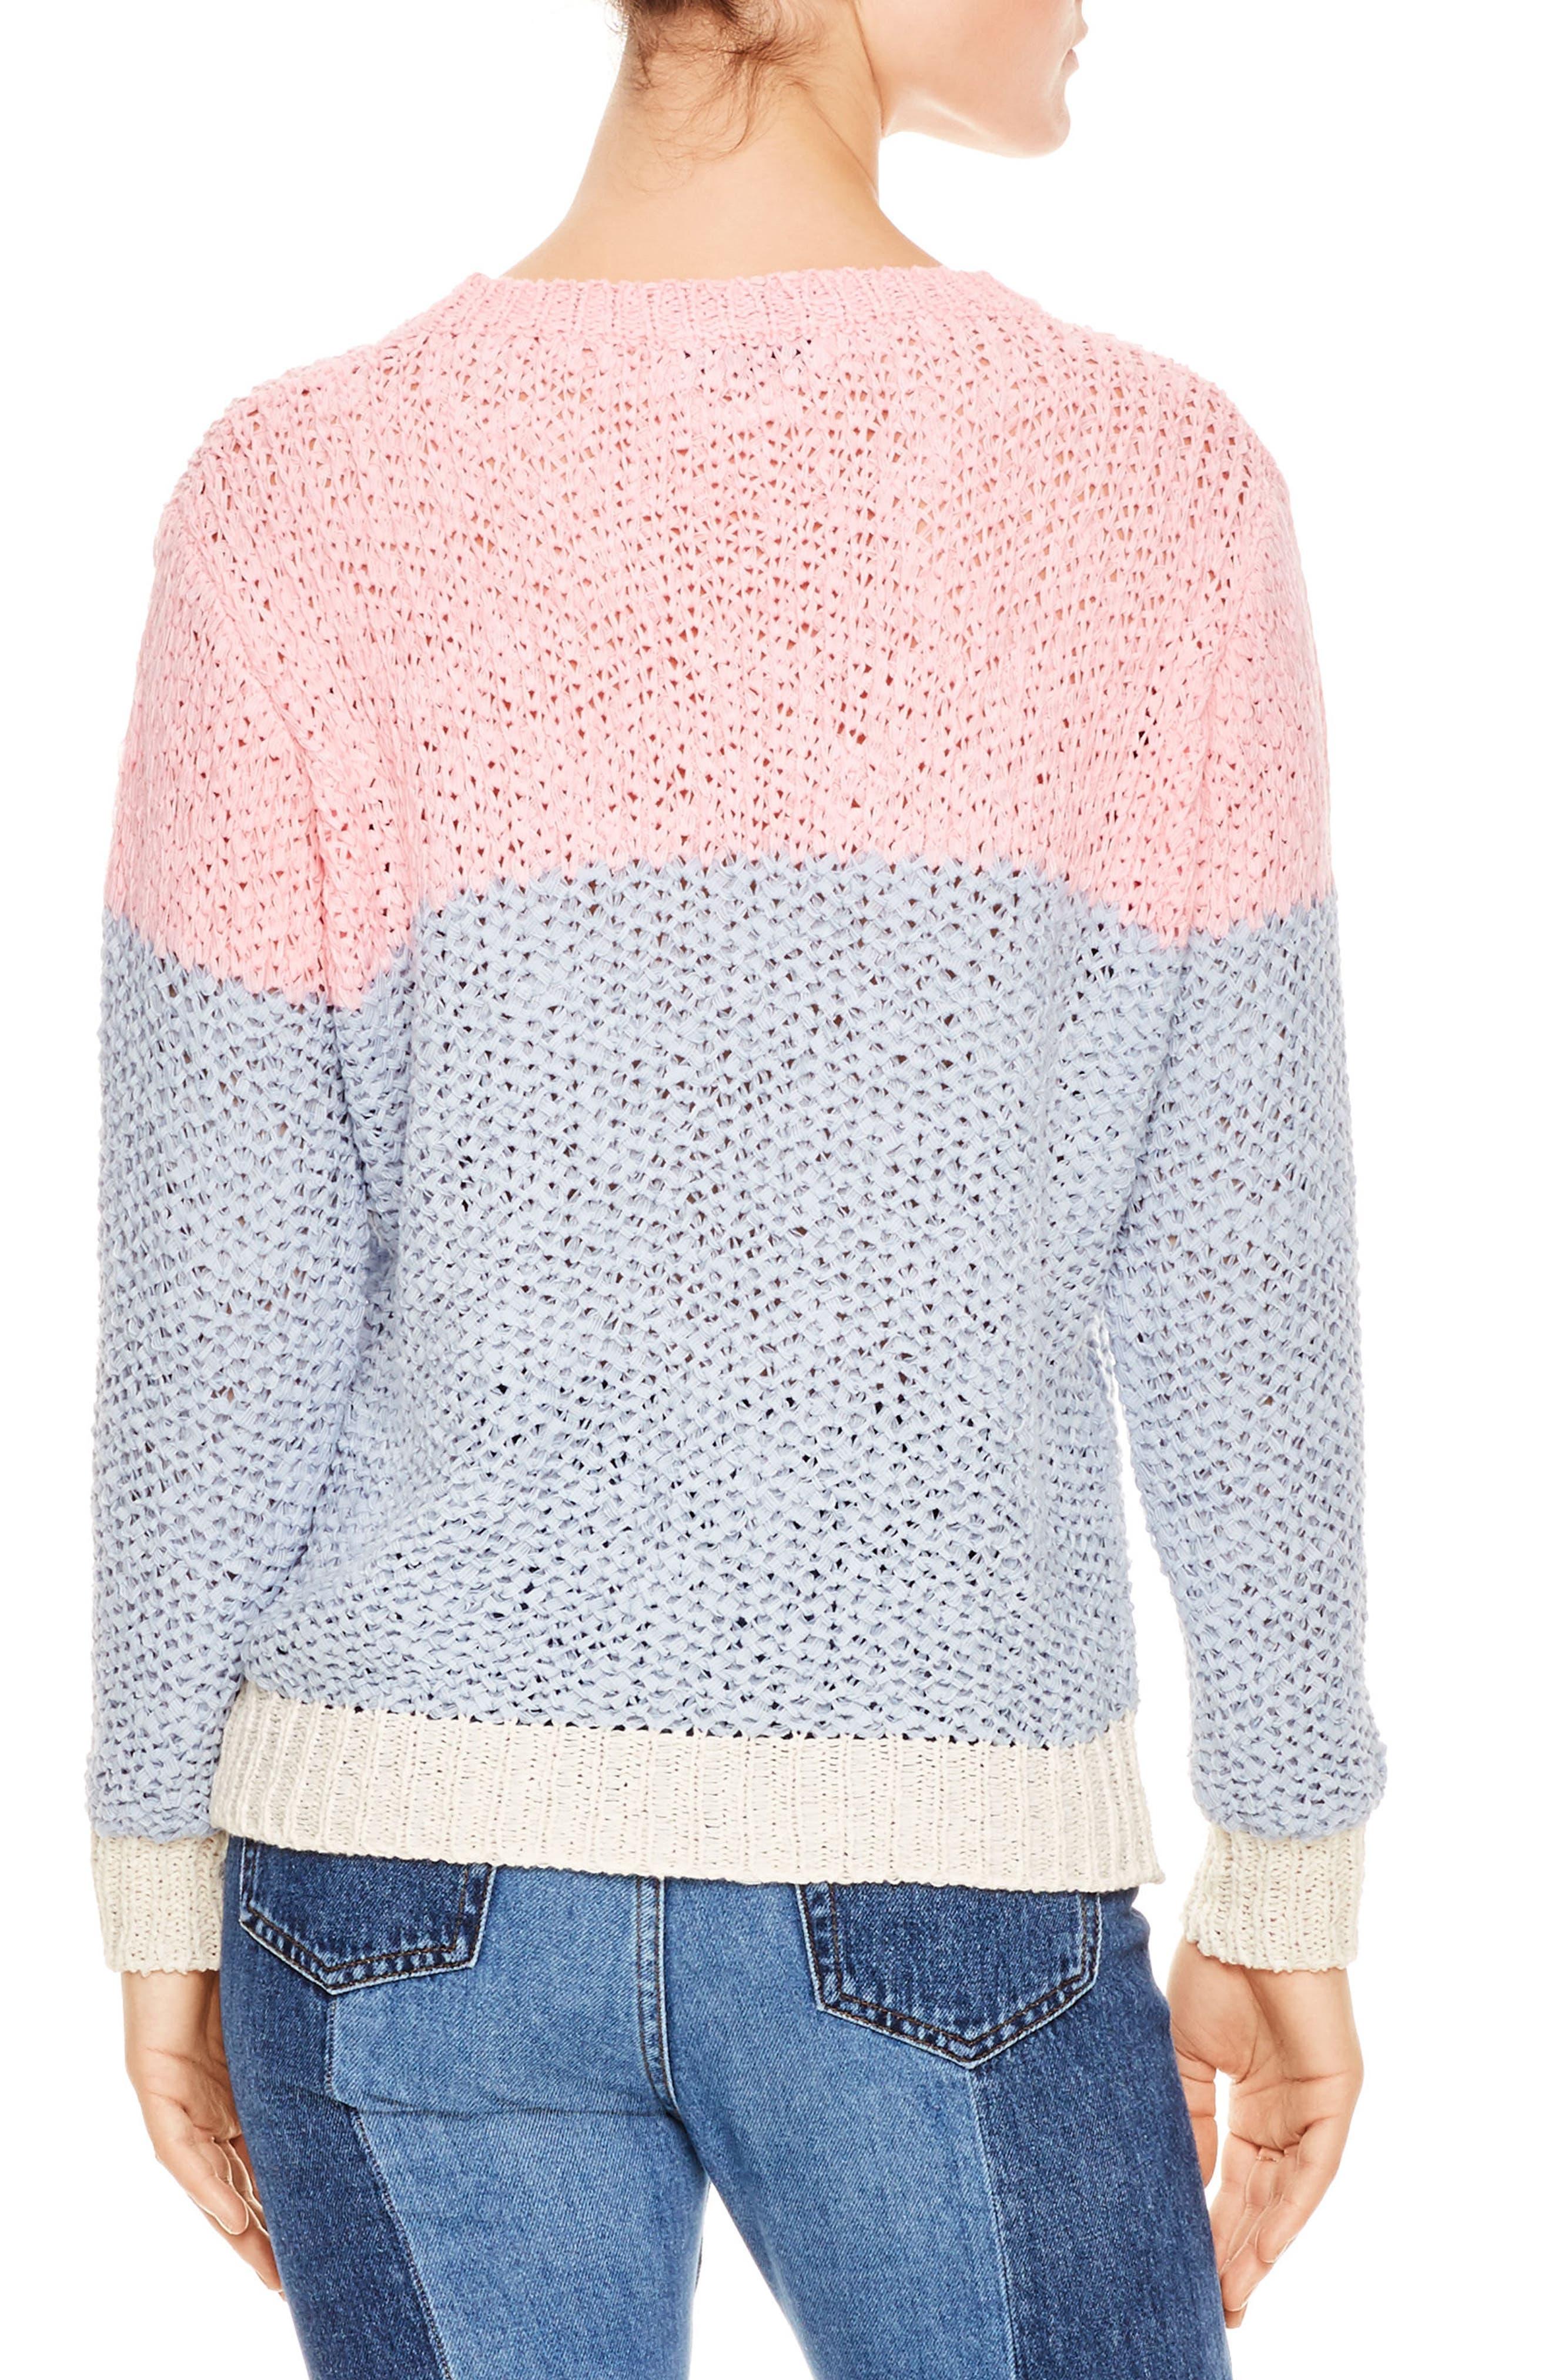 Malabar Colorblock Knit Sweater,                             Alternate thumbnail 2, color,                             Malabar